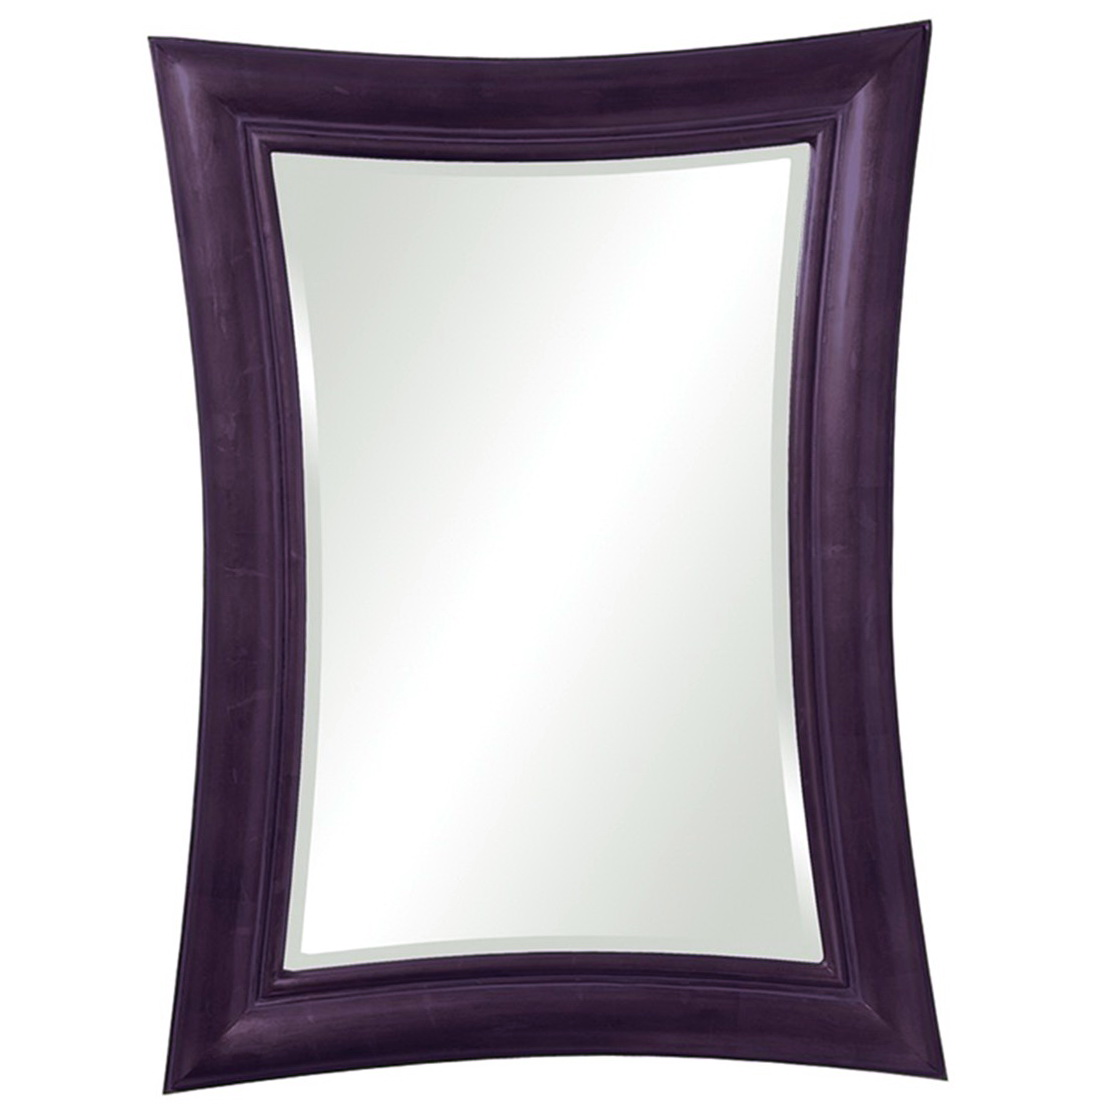 Howard Elliott Mirrors Best Price